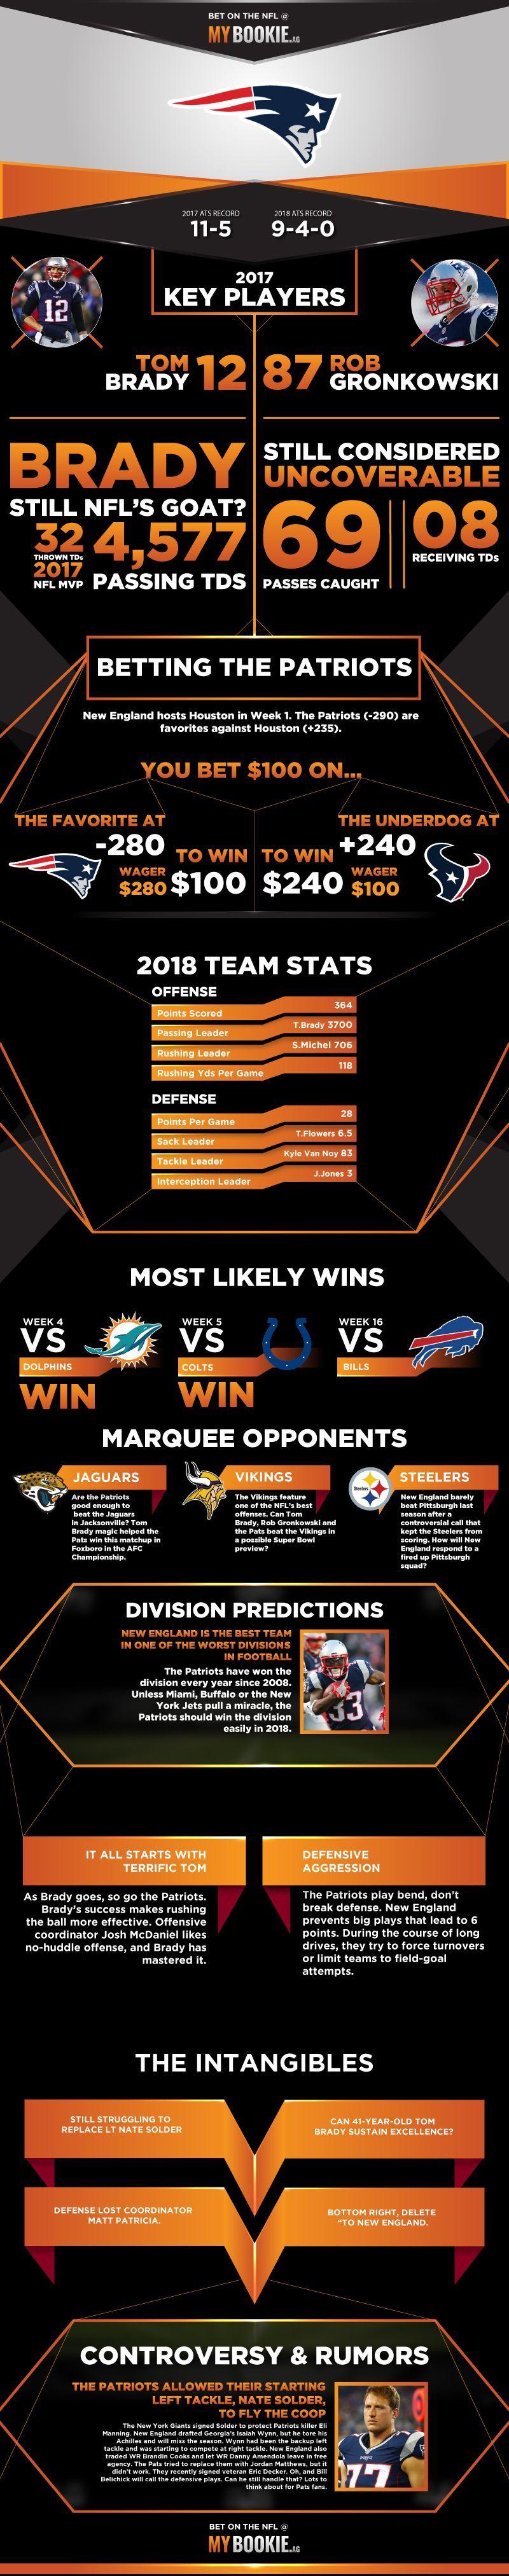 New England Patriots Odds, 2020 News, Scores, NFL Lines